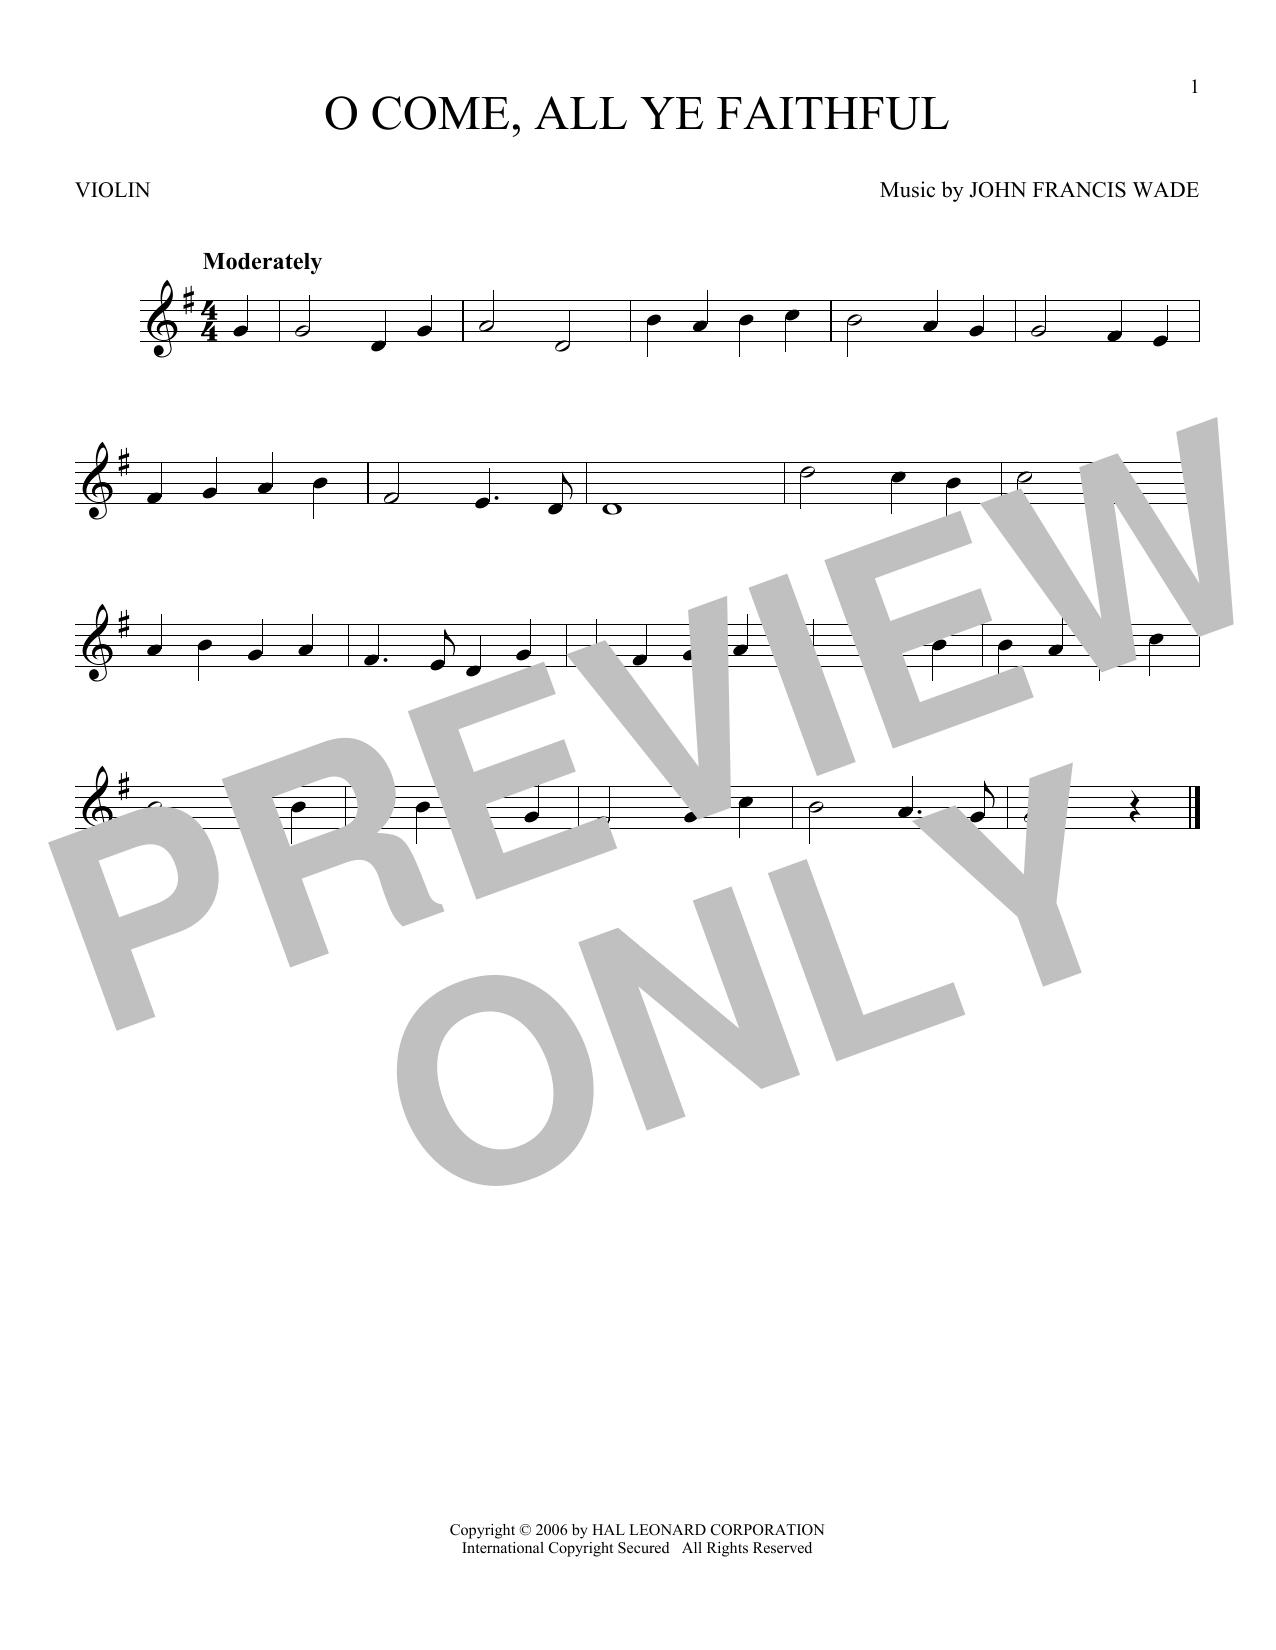 O Come All Ye Faithful Print Sheet Music Now